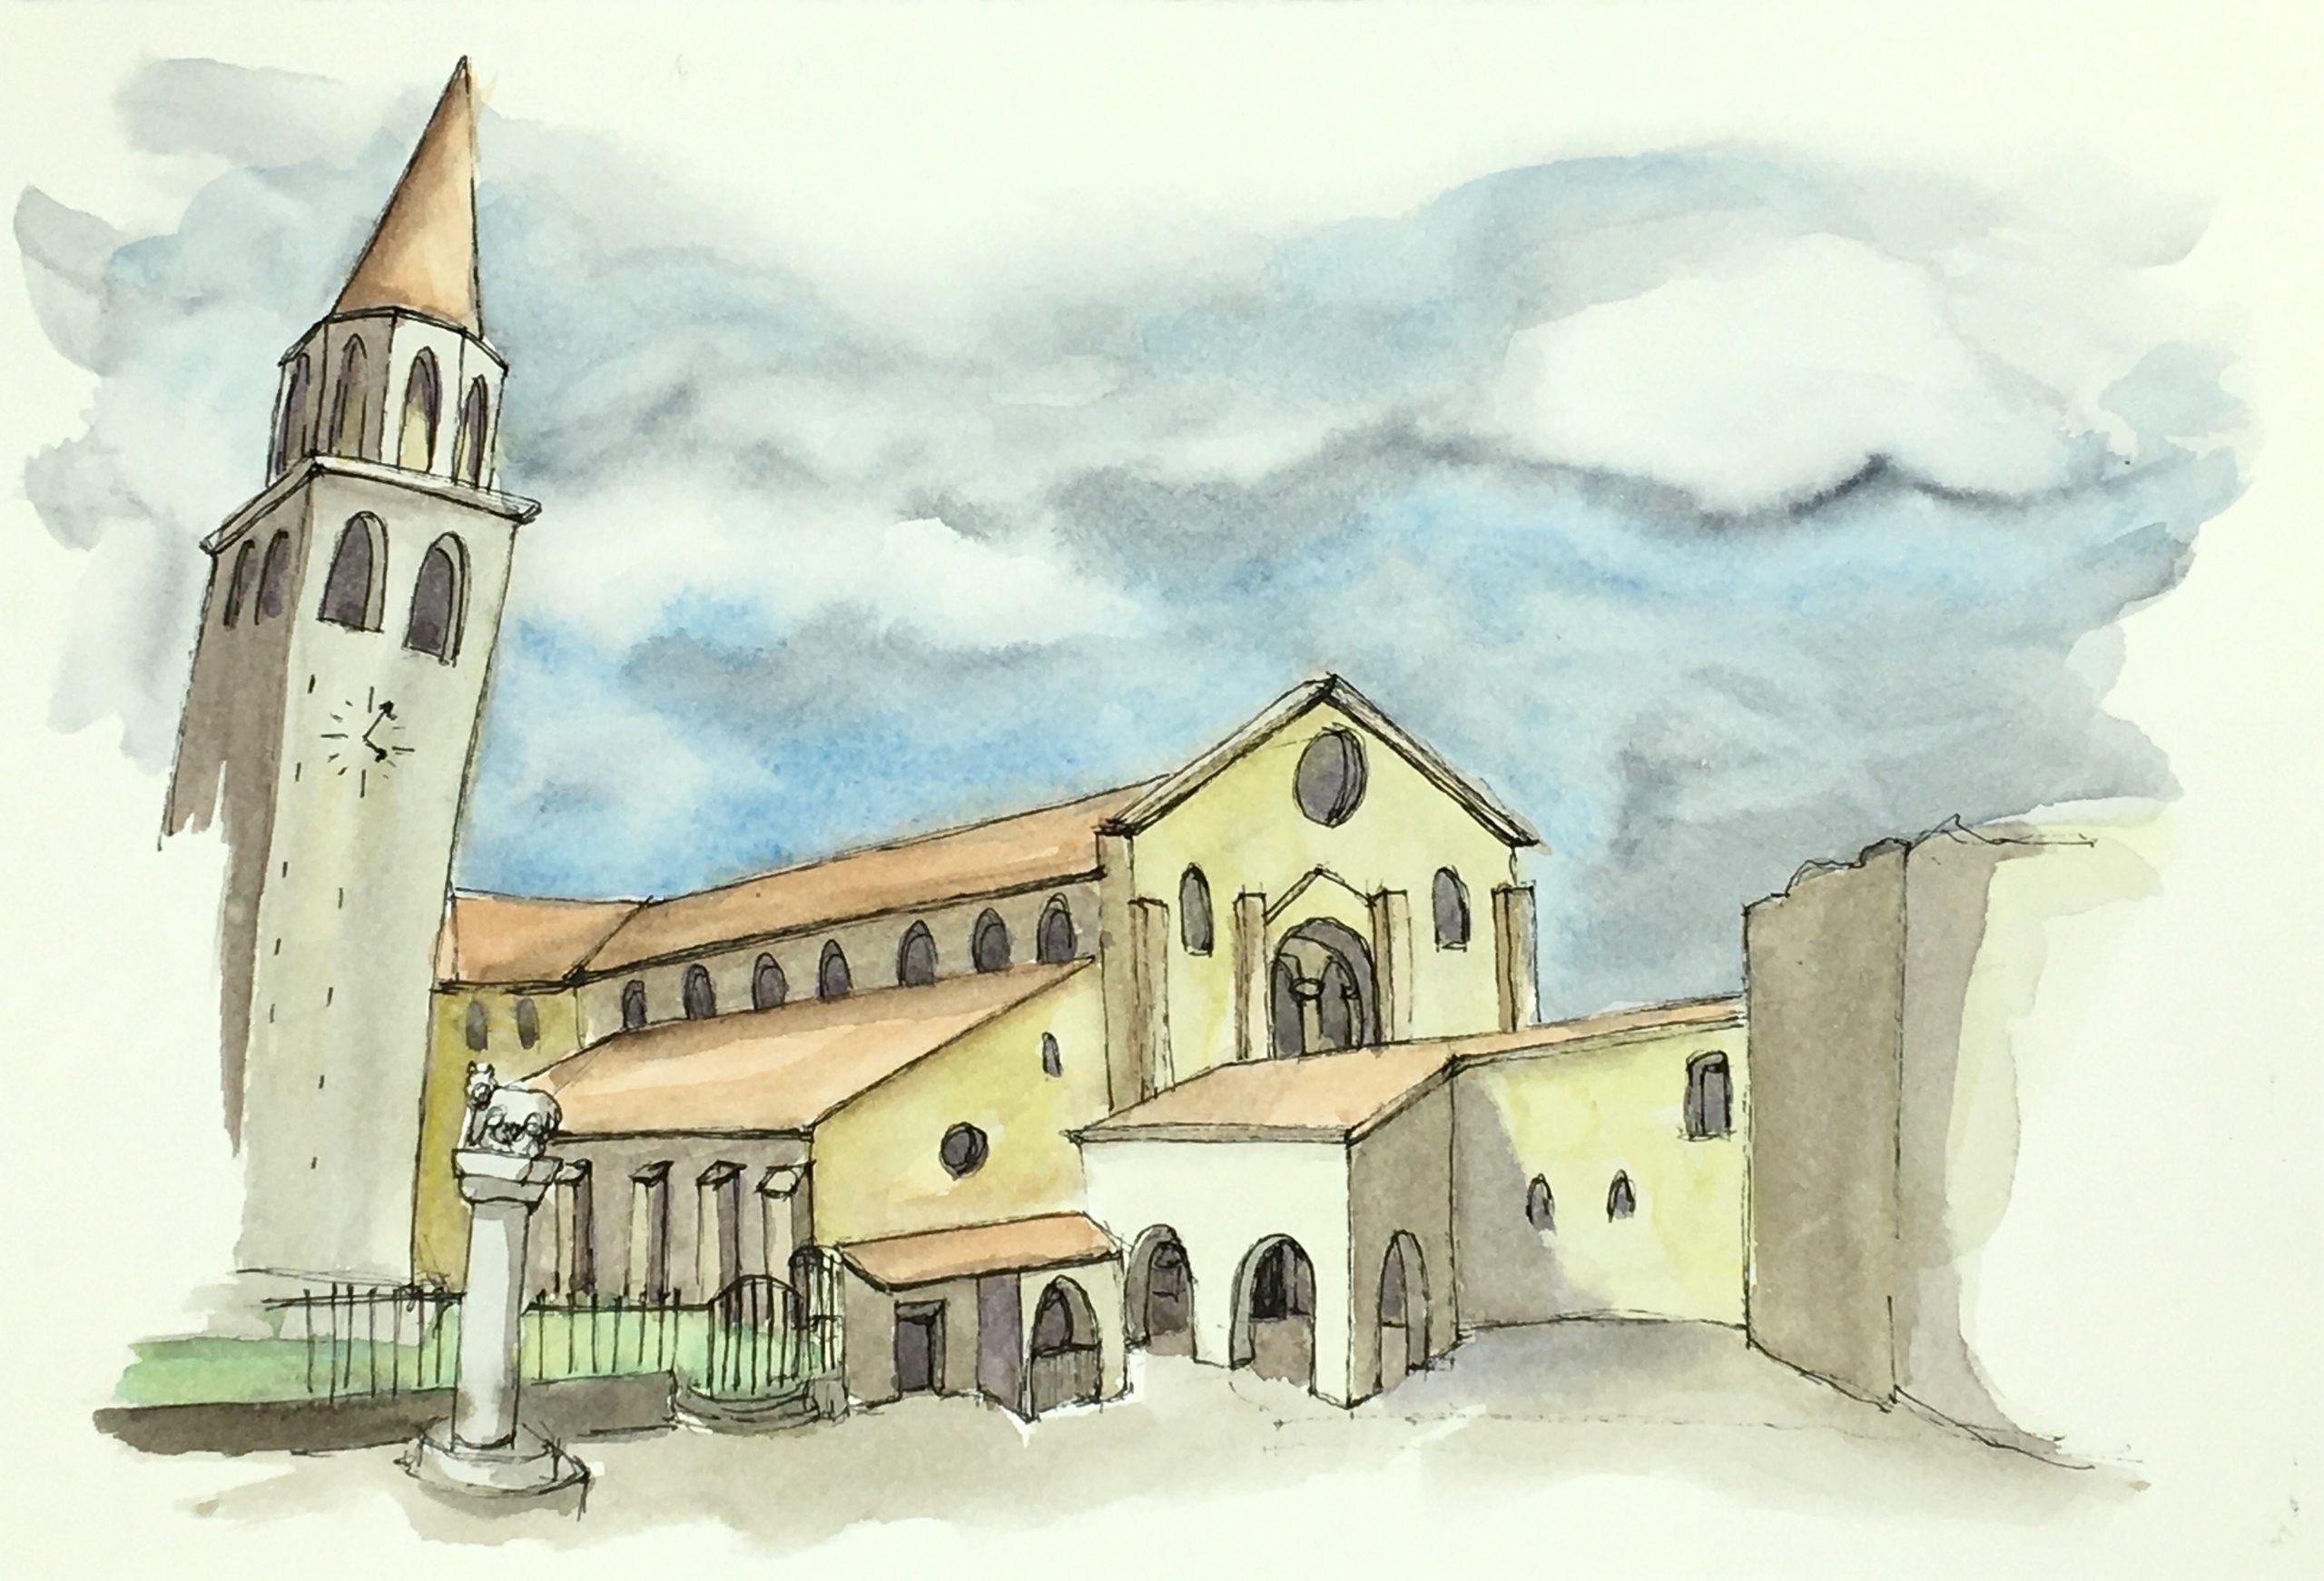 Painting The Basilica of Santa Maria Assunta in Aquileia